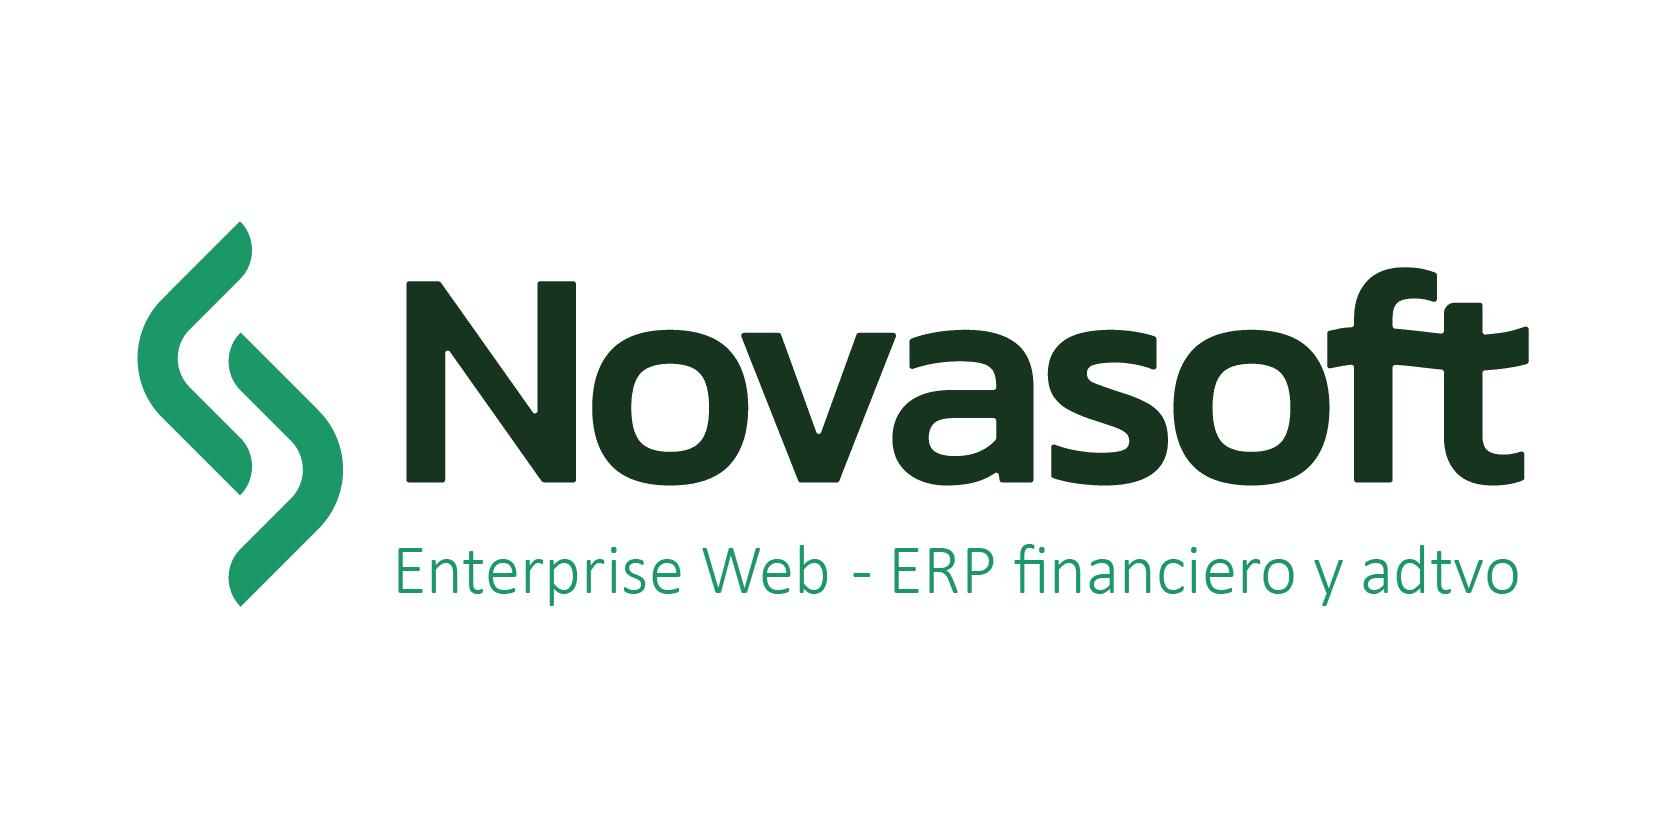 NOVASOFT ENTERPRISE WEB ERP - Software Administrativo y Financiero de Gestión Modular e Integrado – ERP